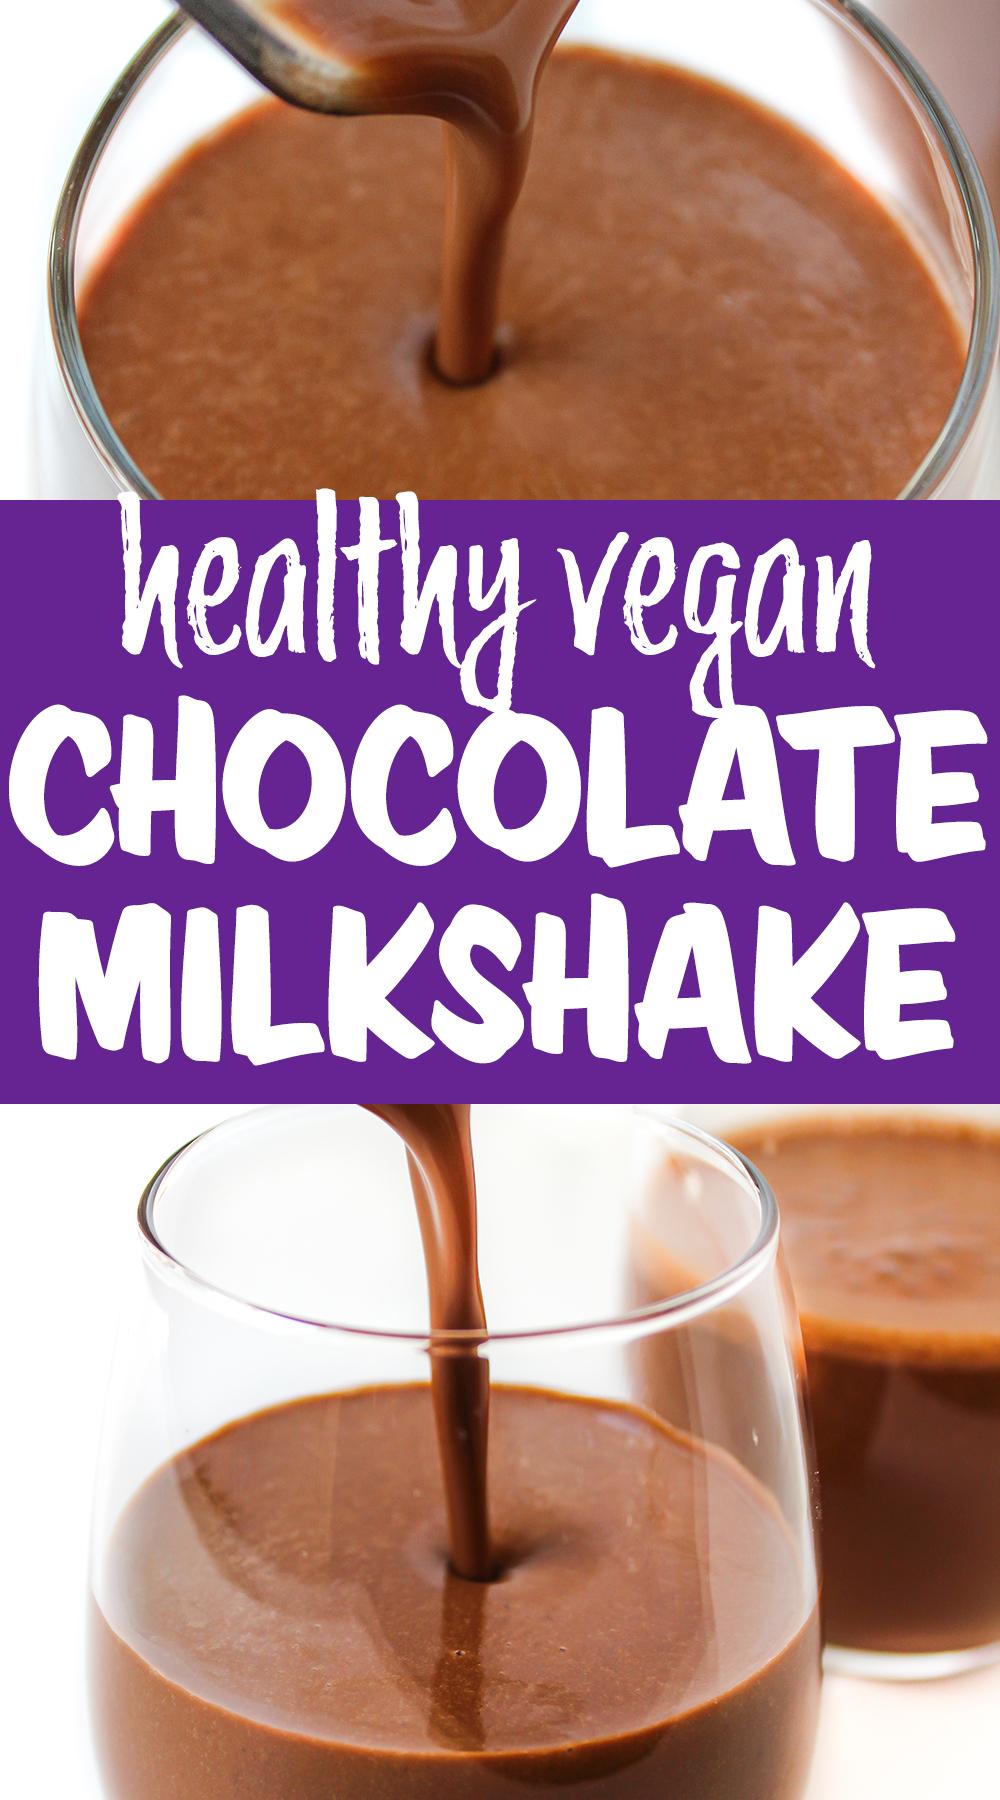 healthy milkshake photo collage